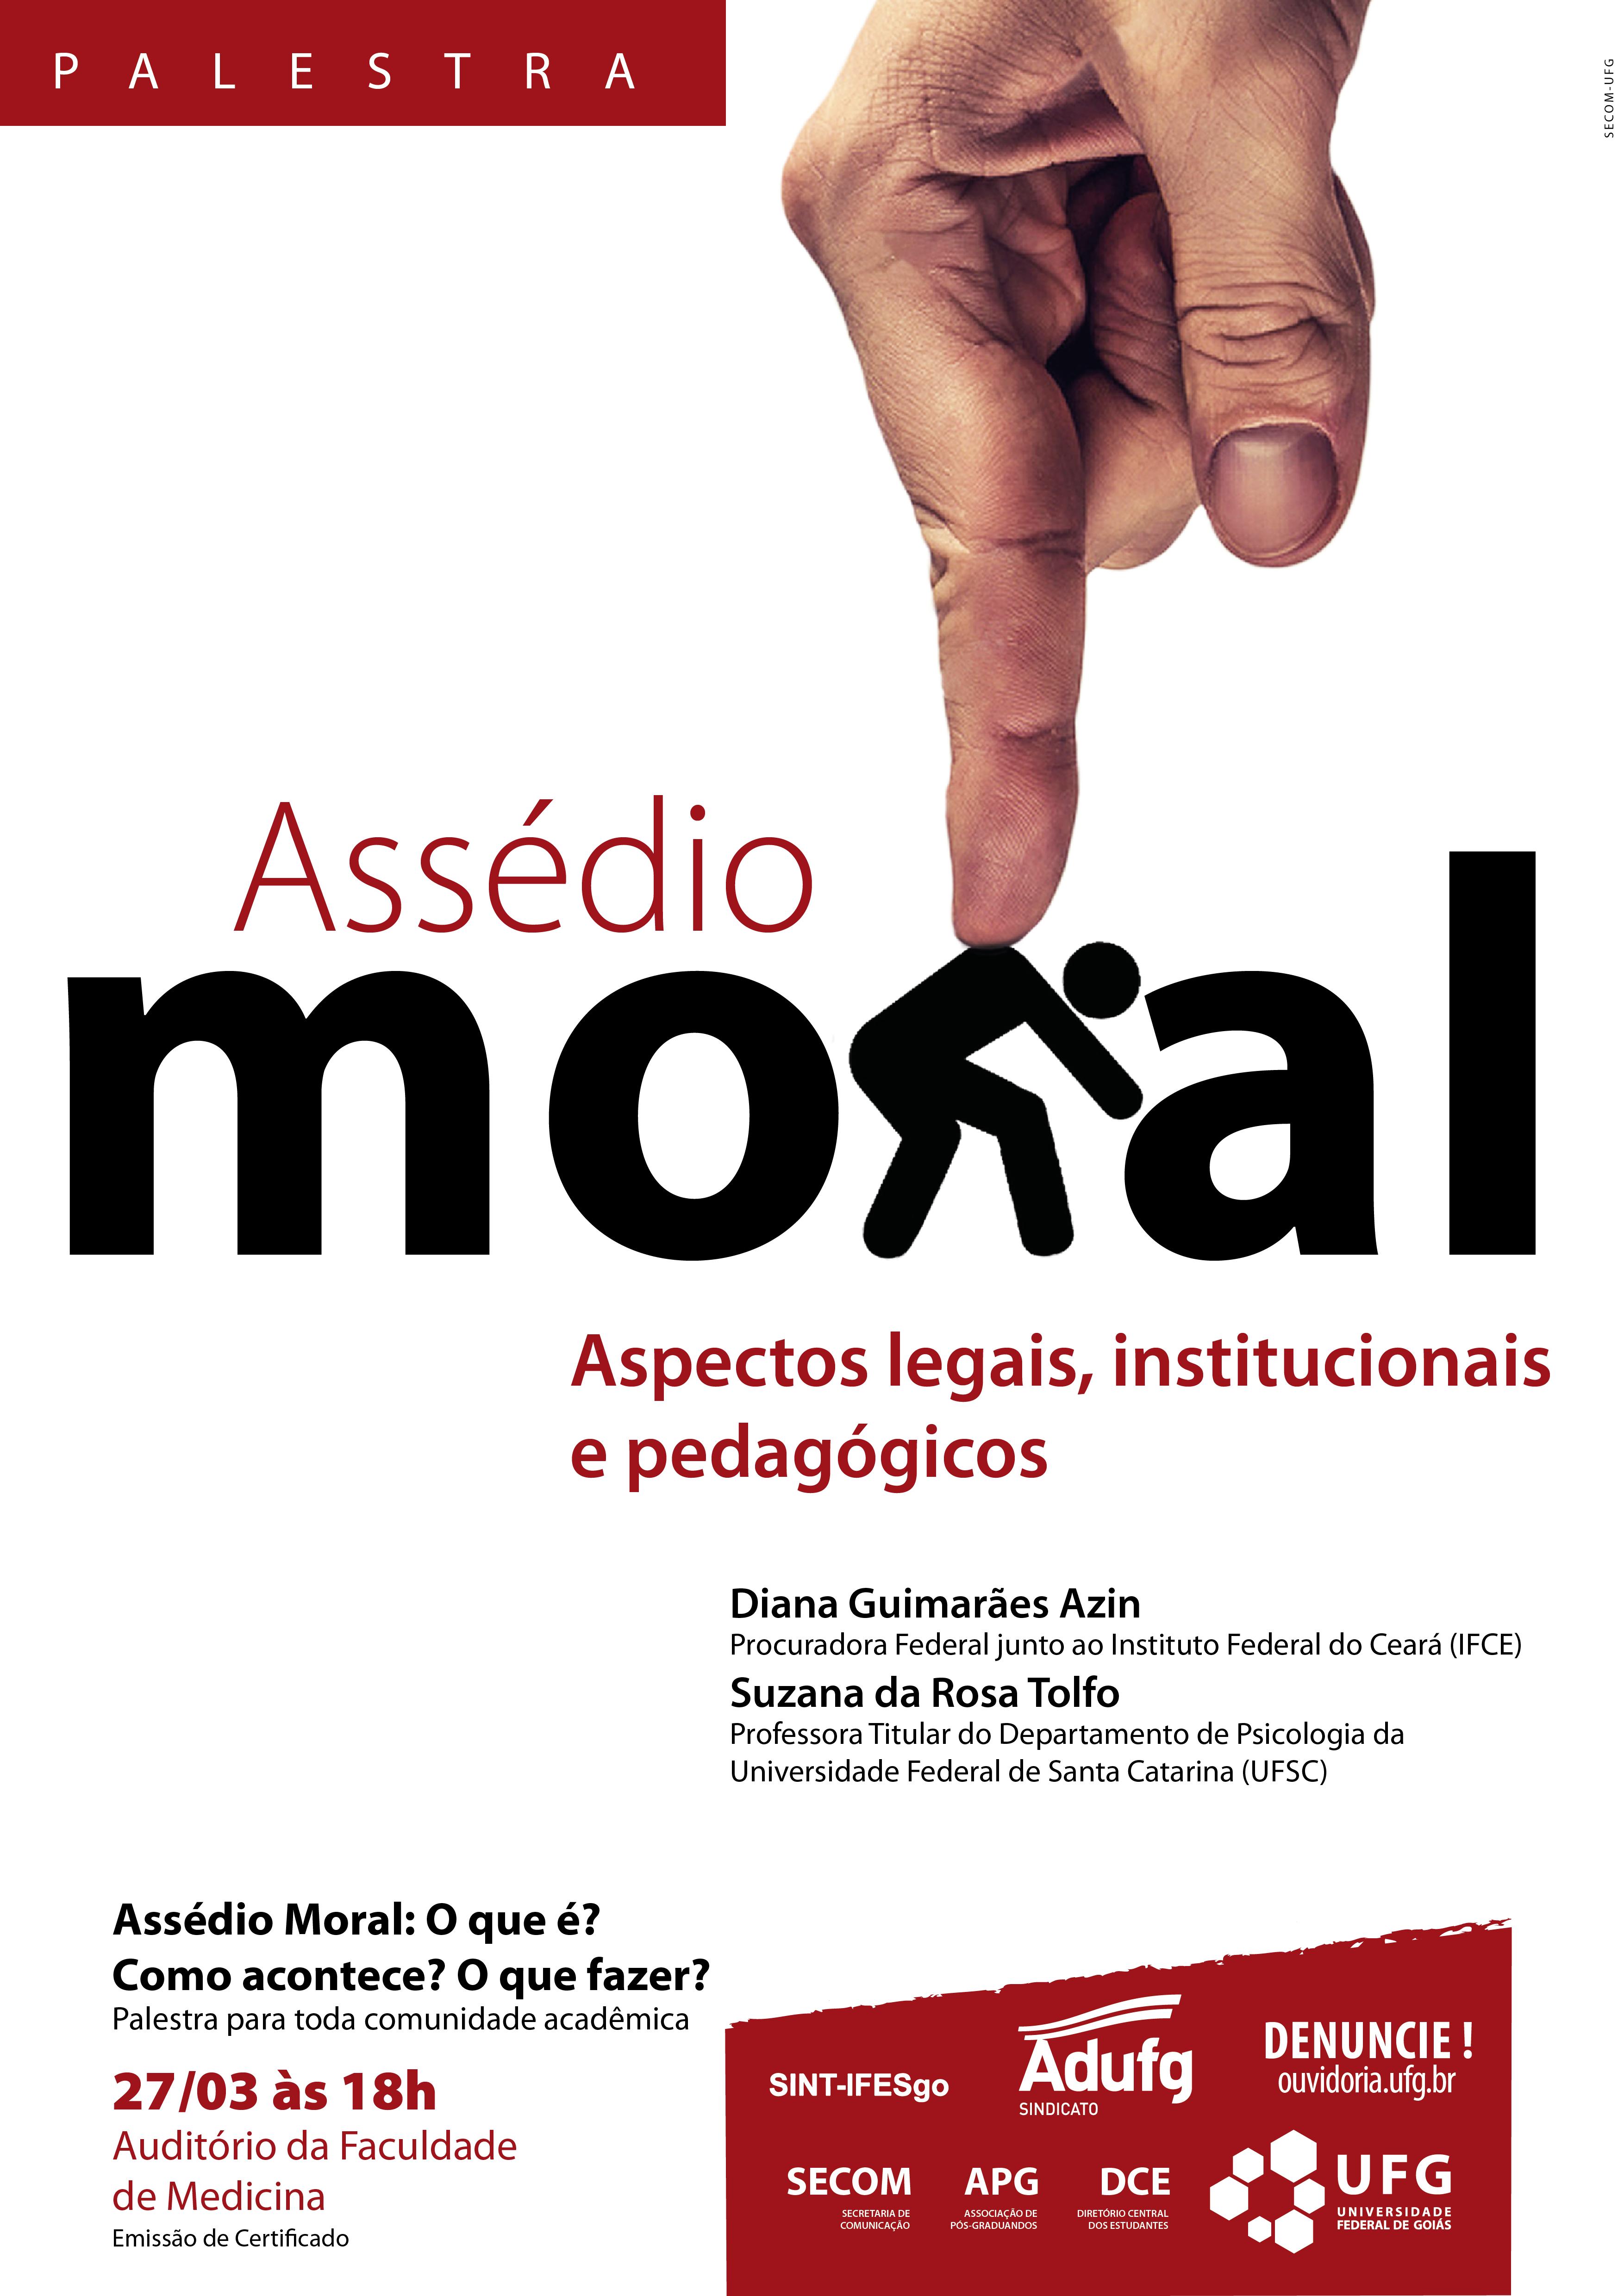 palestra_ASSEDIO_MORAL_2019-NOTURNO-01.png